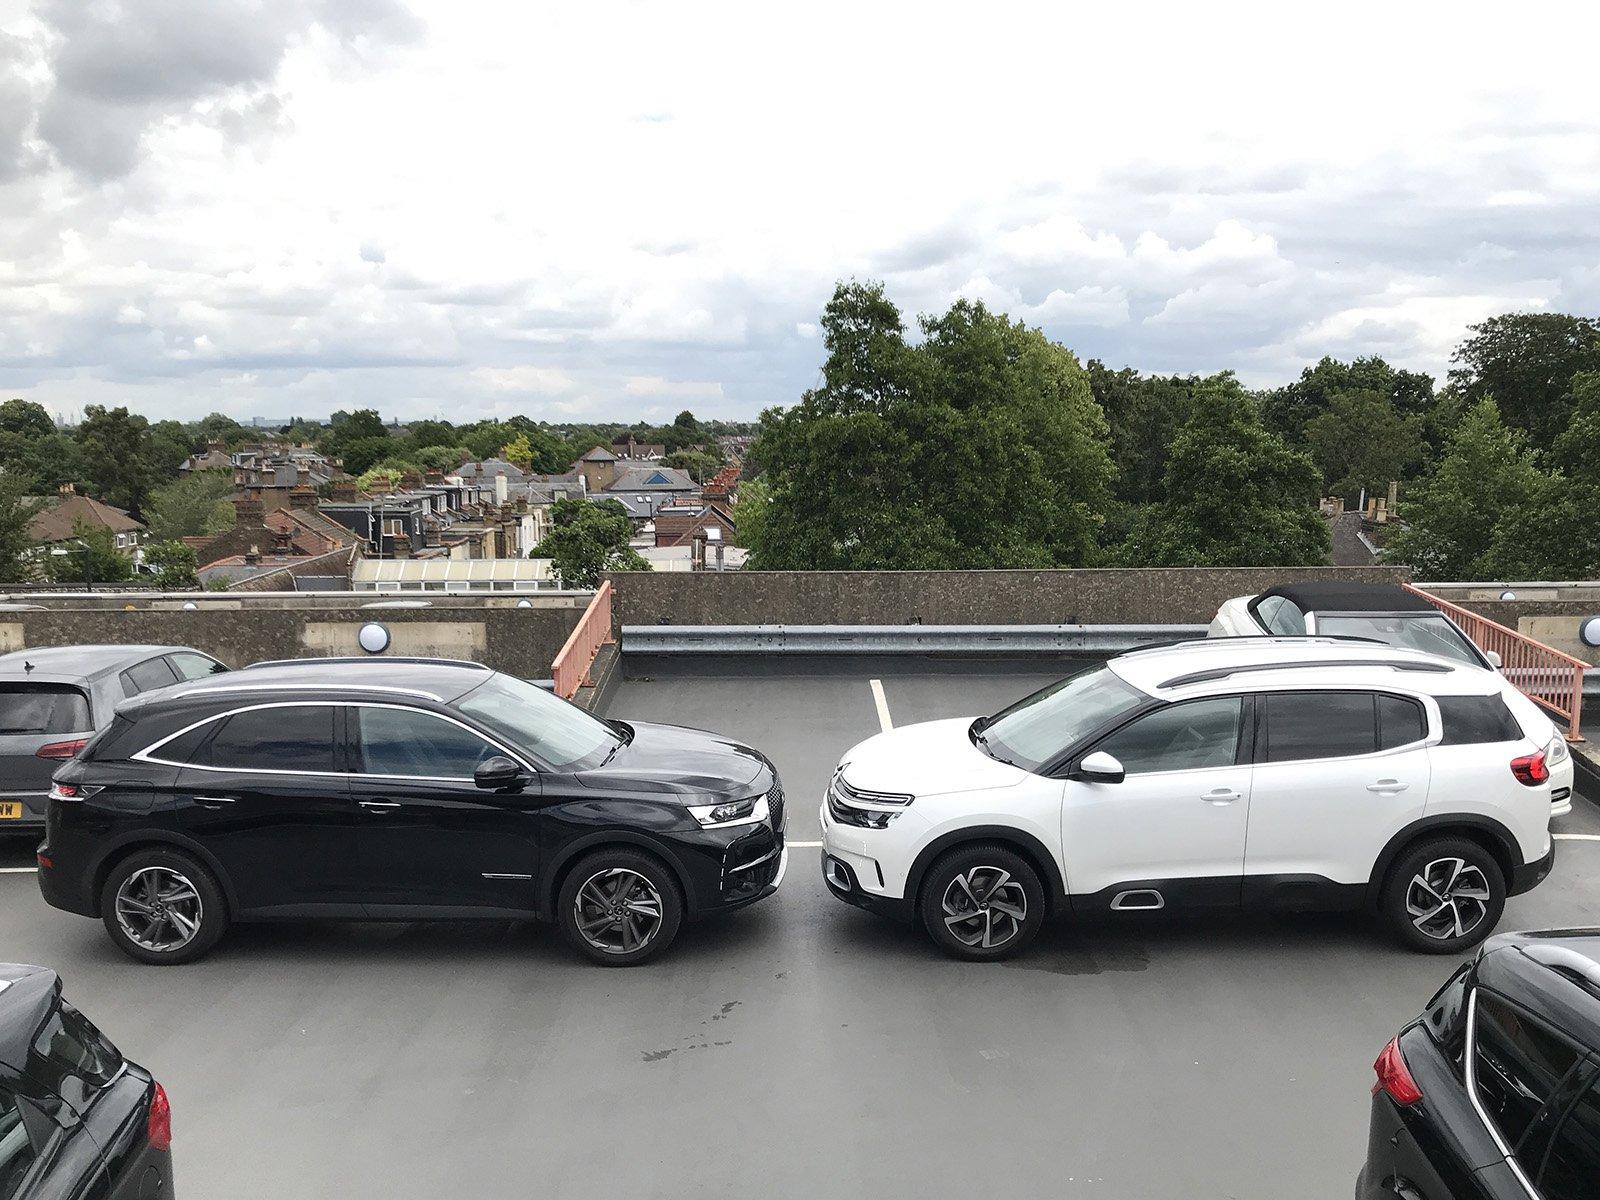 Citroën C5 Aircross long-term test